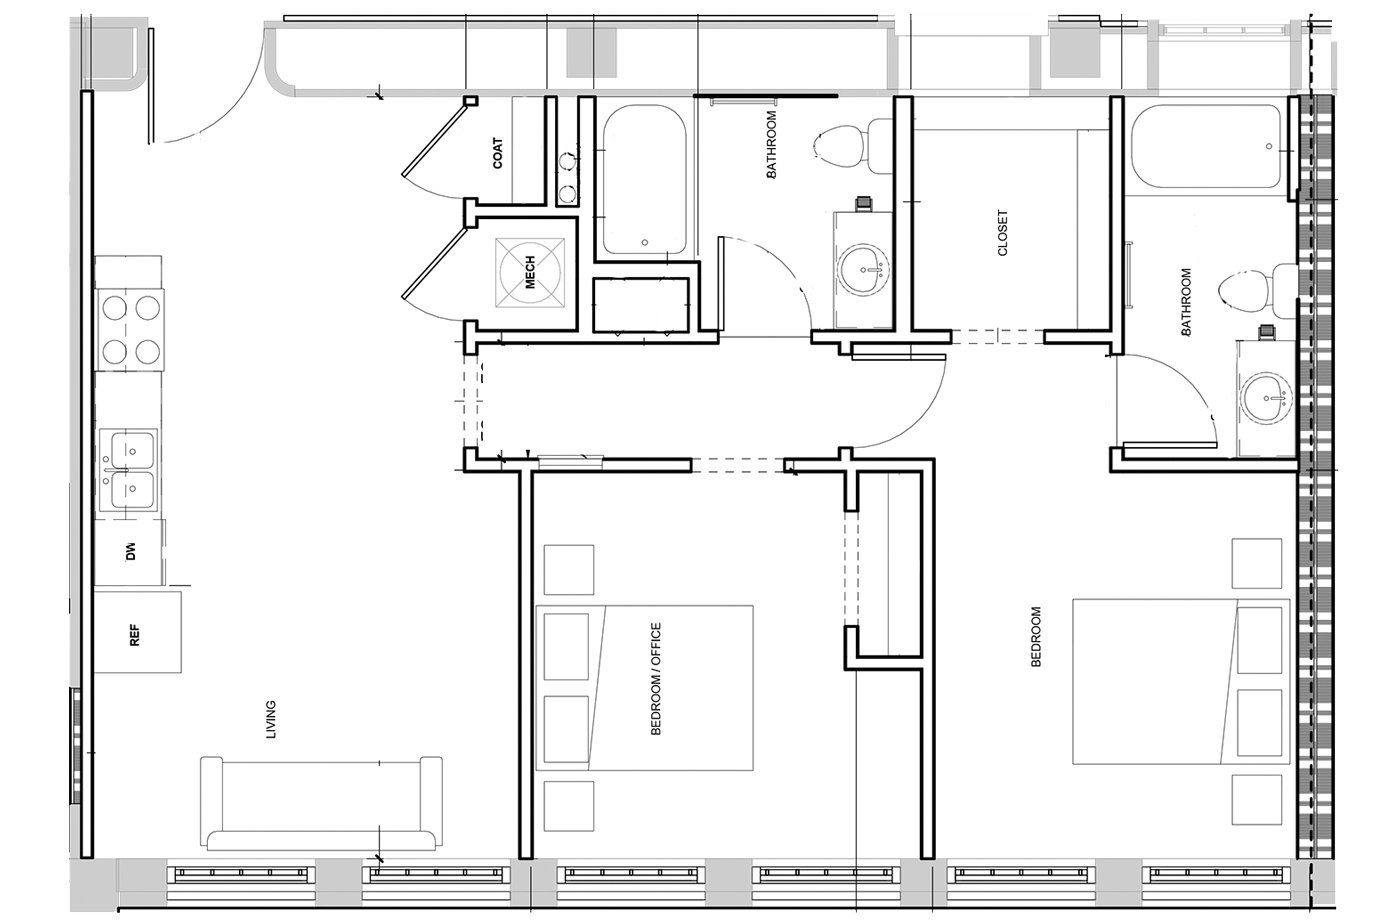 Douglass two bedroom edited floorplan WEB.png